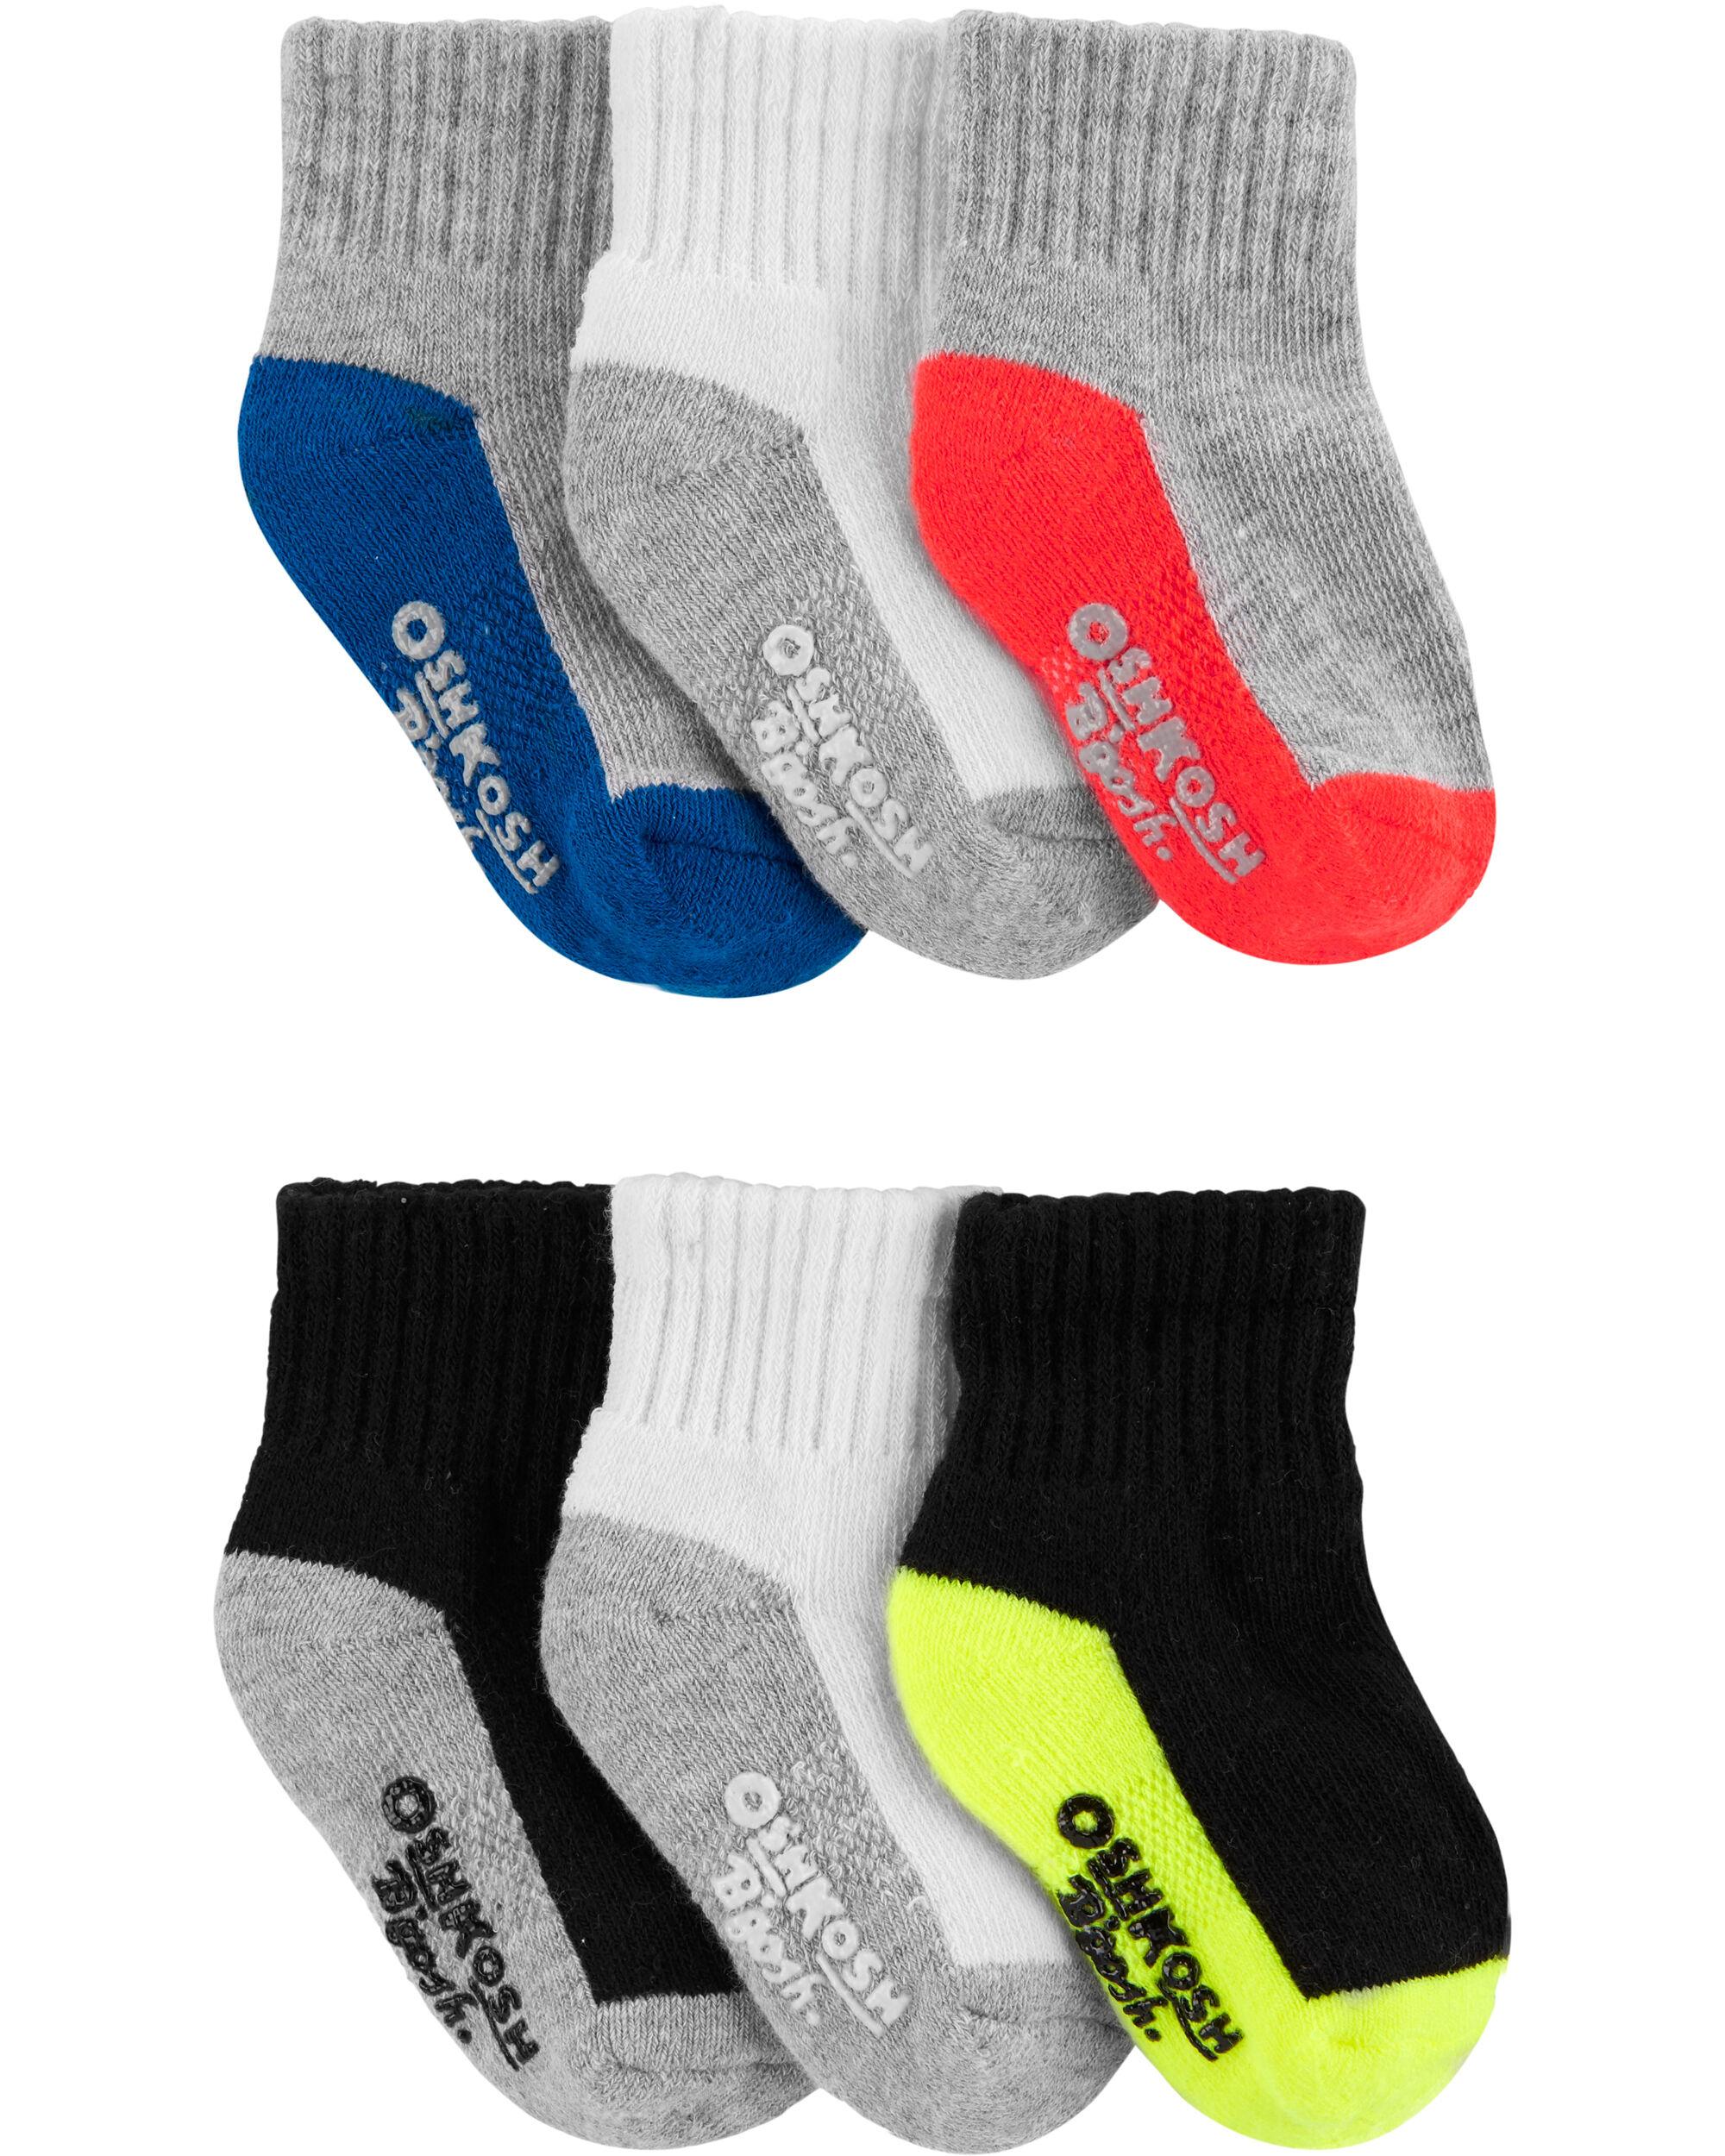 6-Pack Athletic Quarter Crew Socks